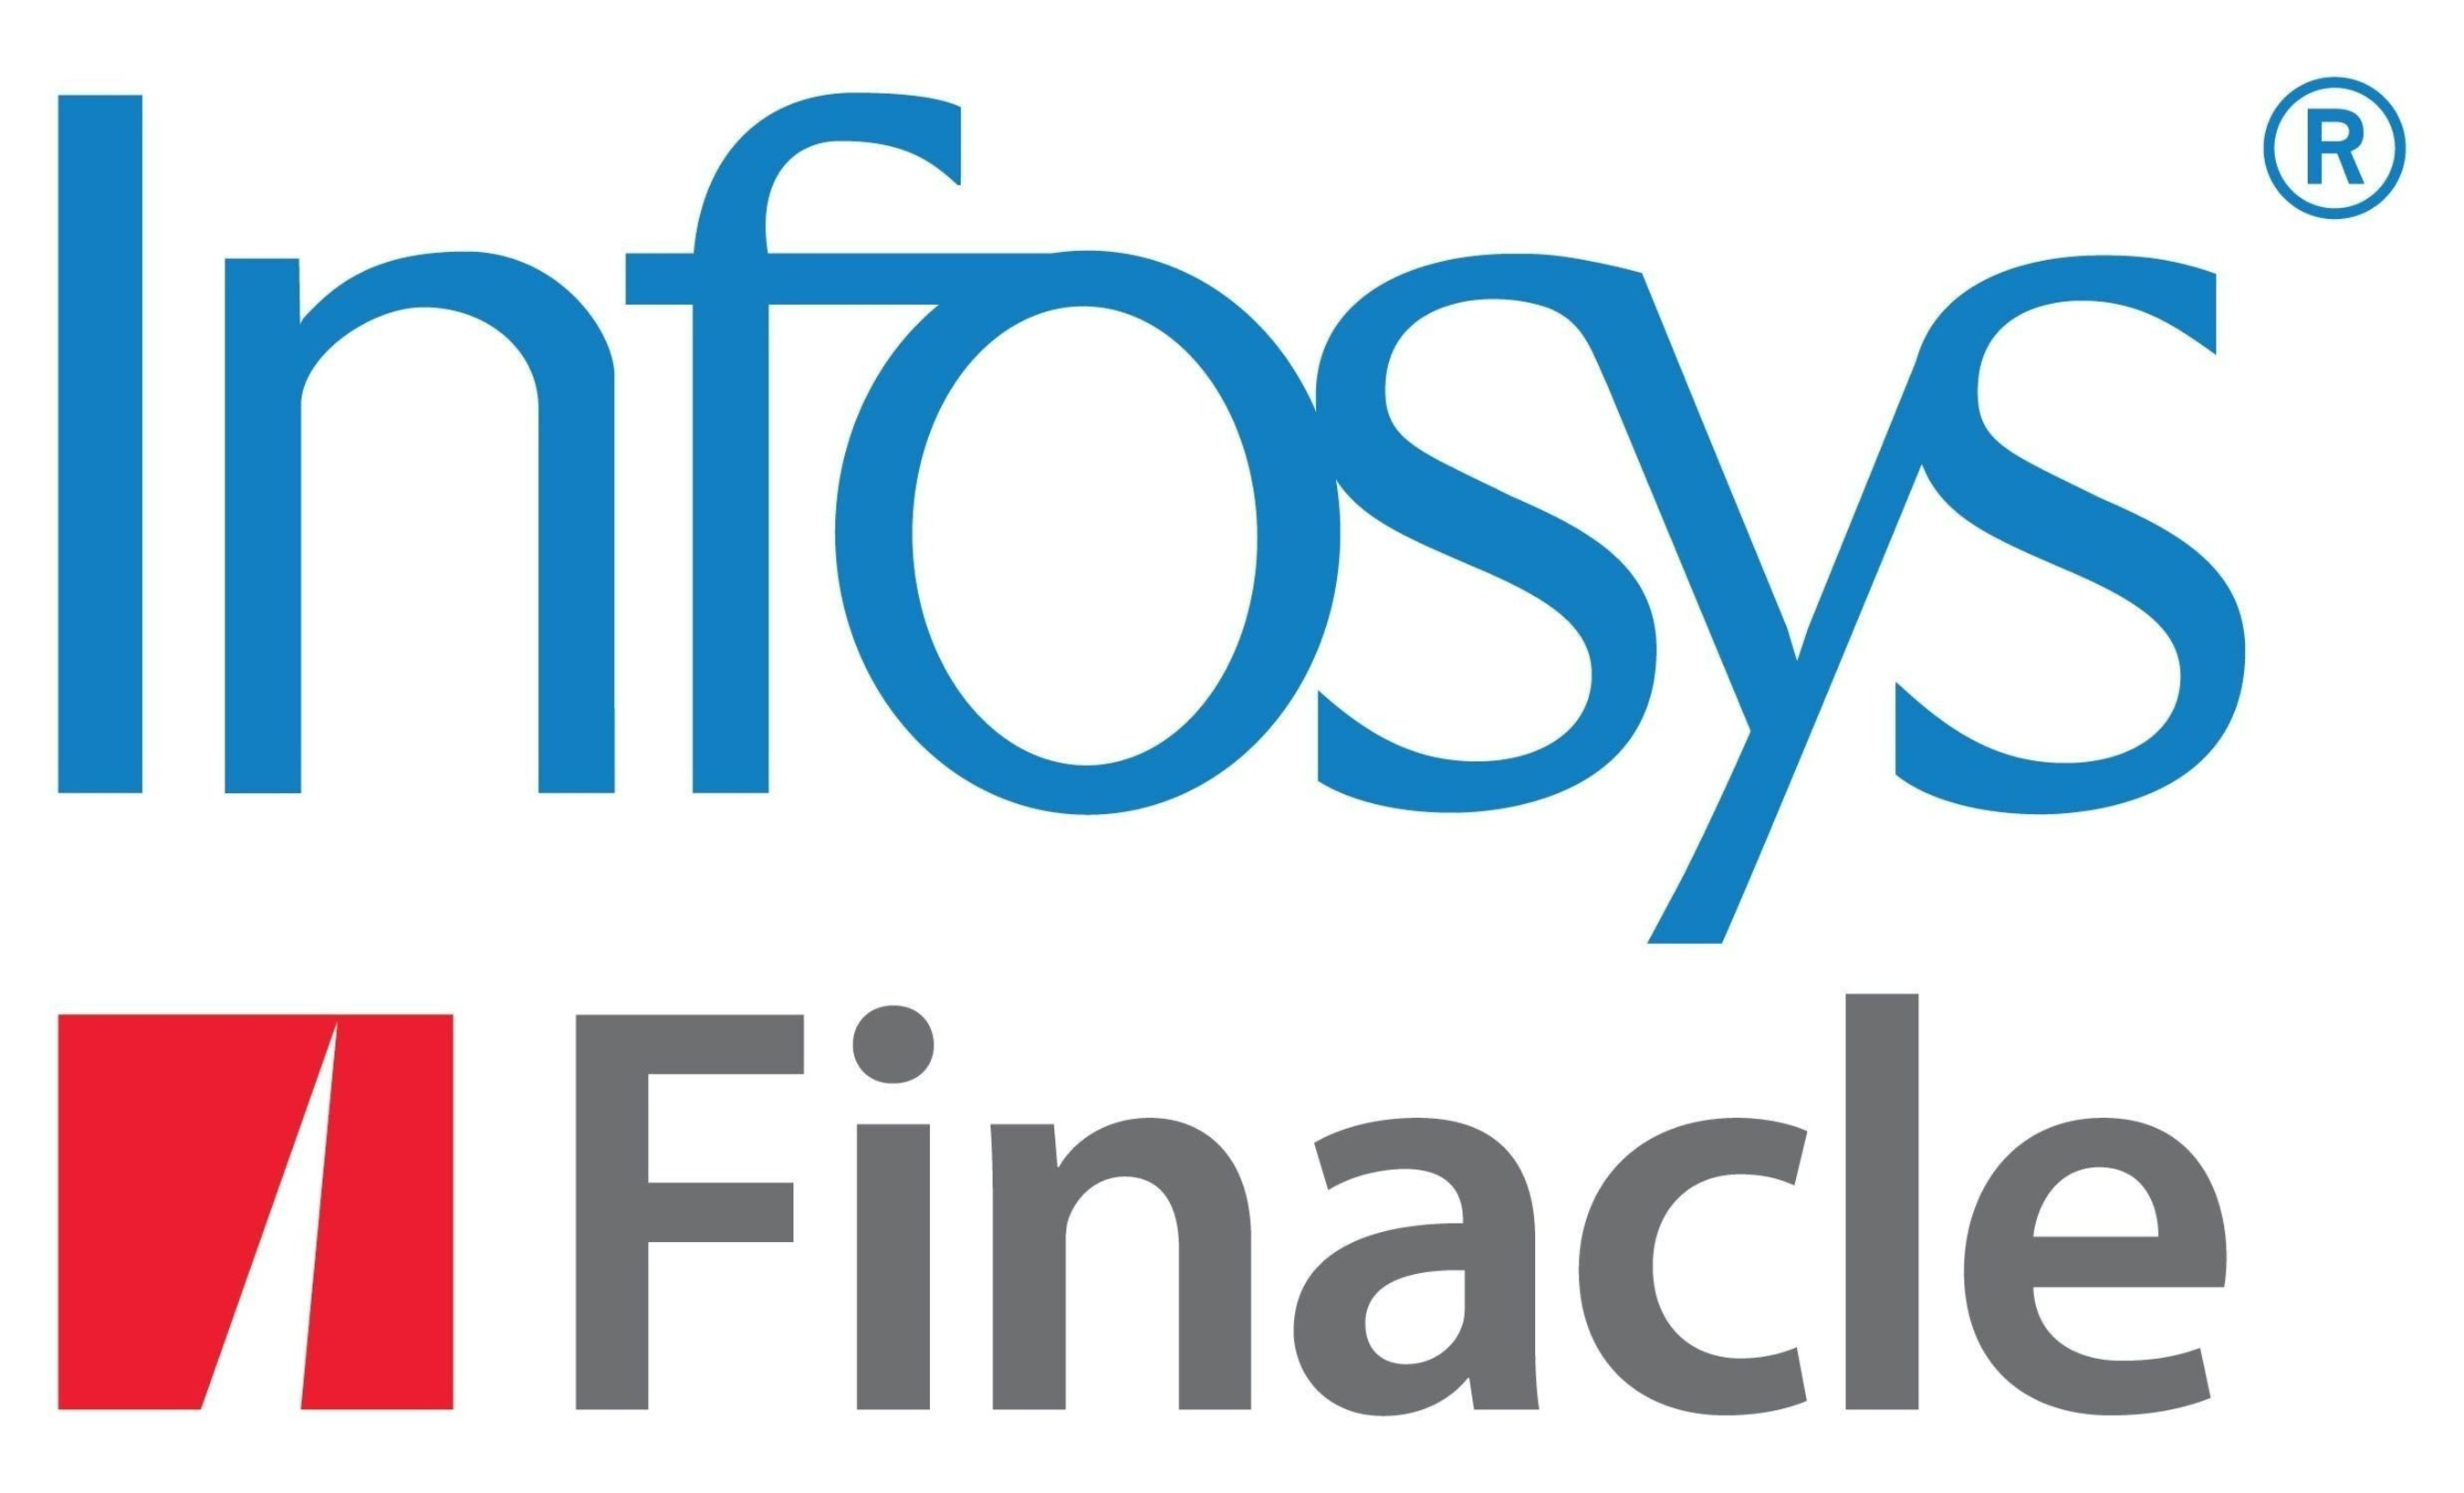 Infosys Finance (PRNewsFoto/Infosys Finance) (PRNewsFoto/Infosys Finance)